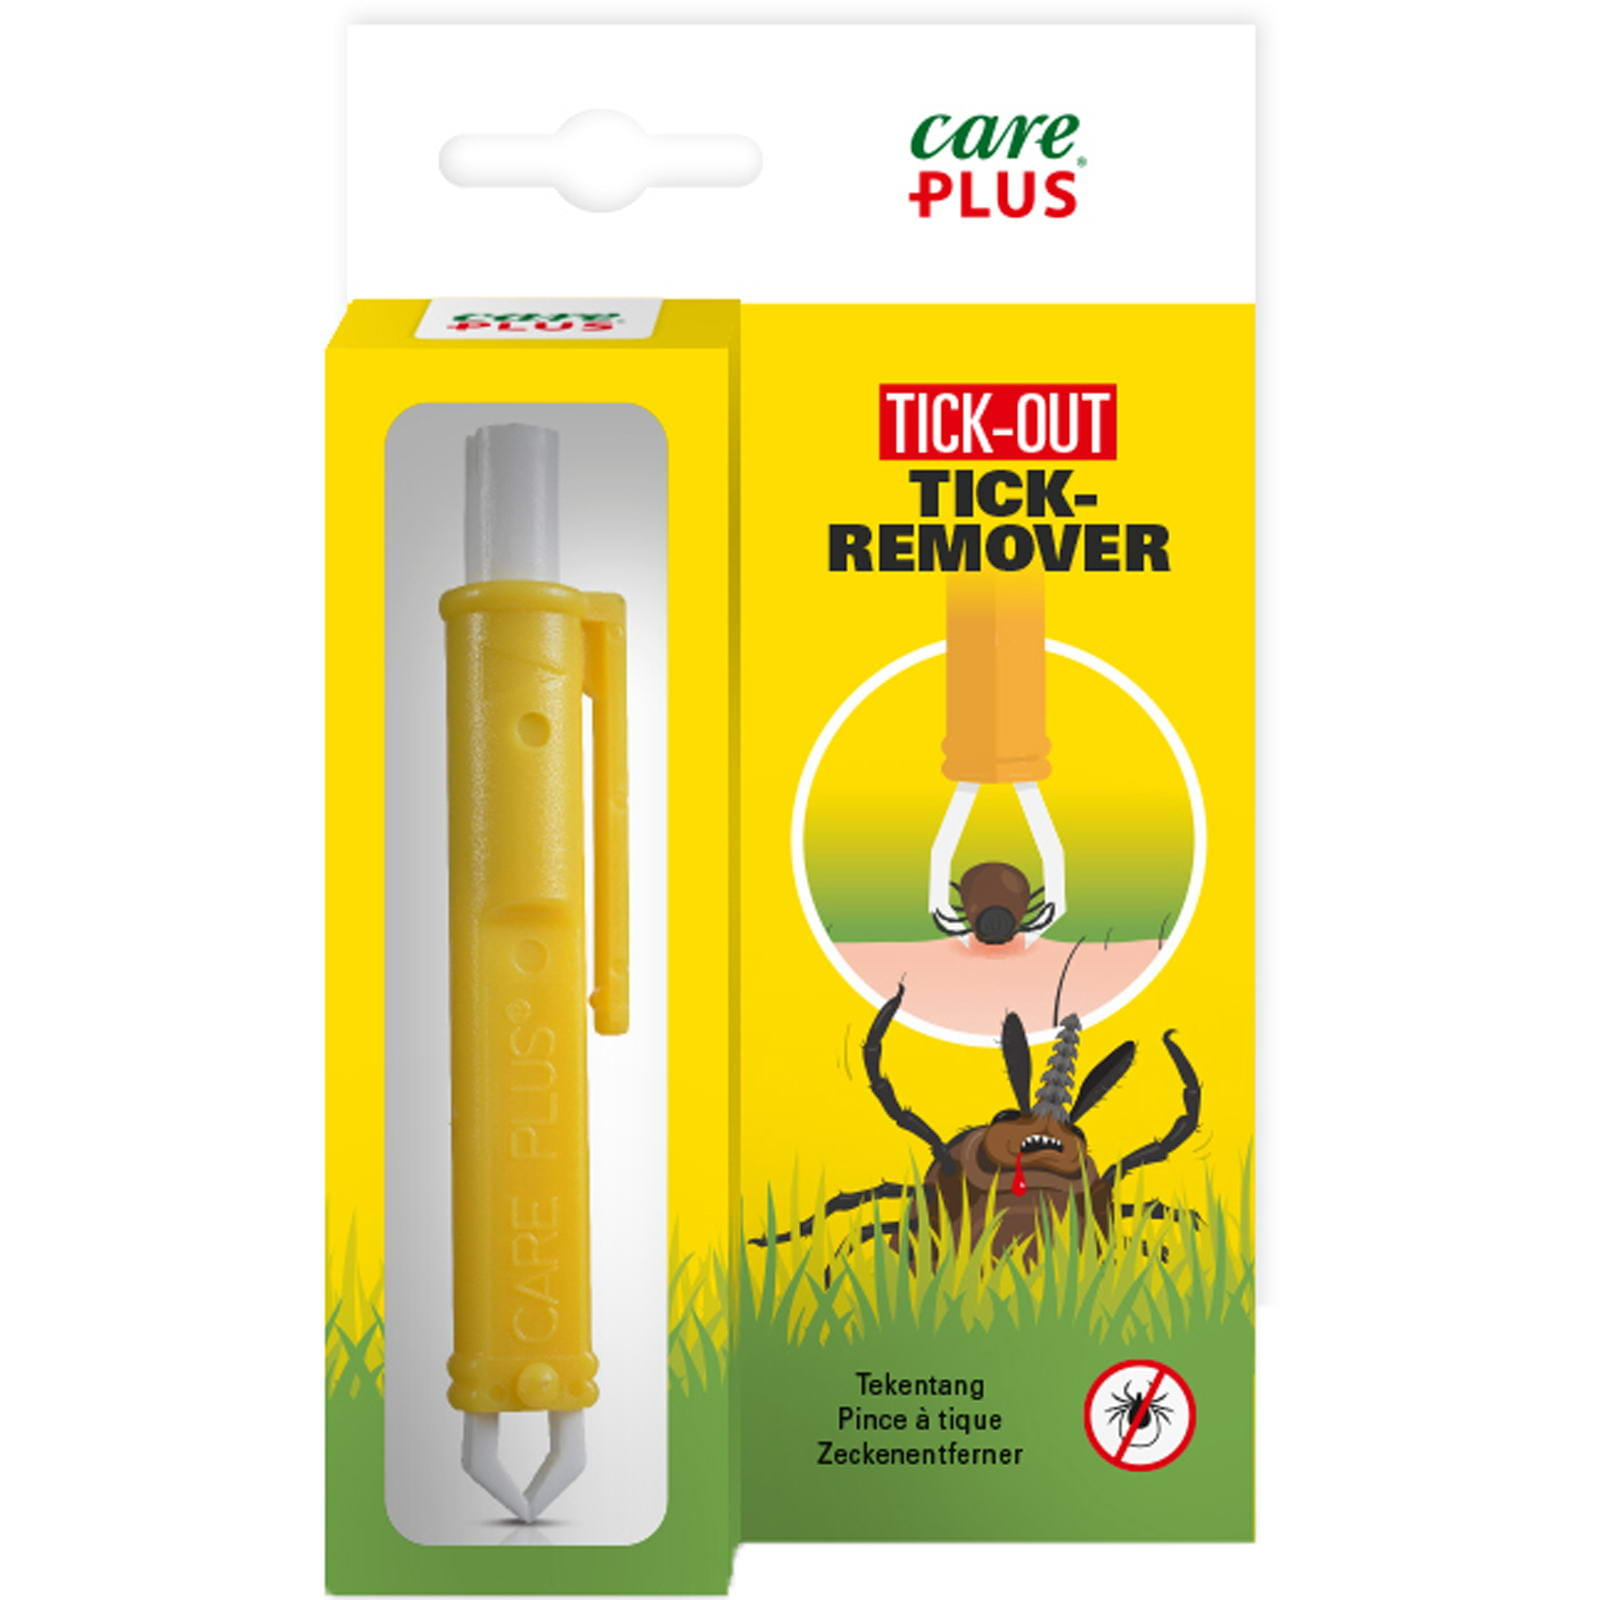 Care Plus Tick-Out Tick-Remover - Zeckenzange - Bild 2